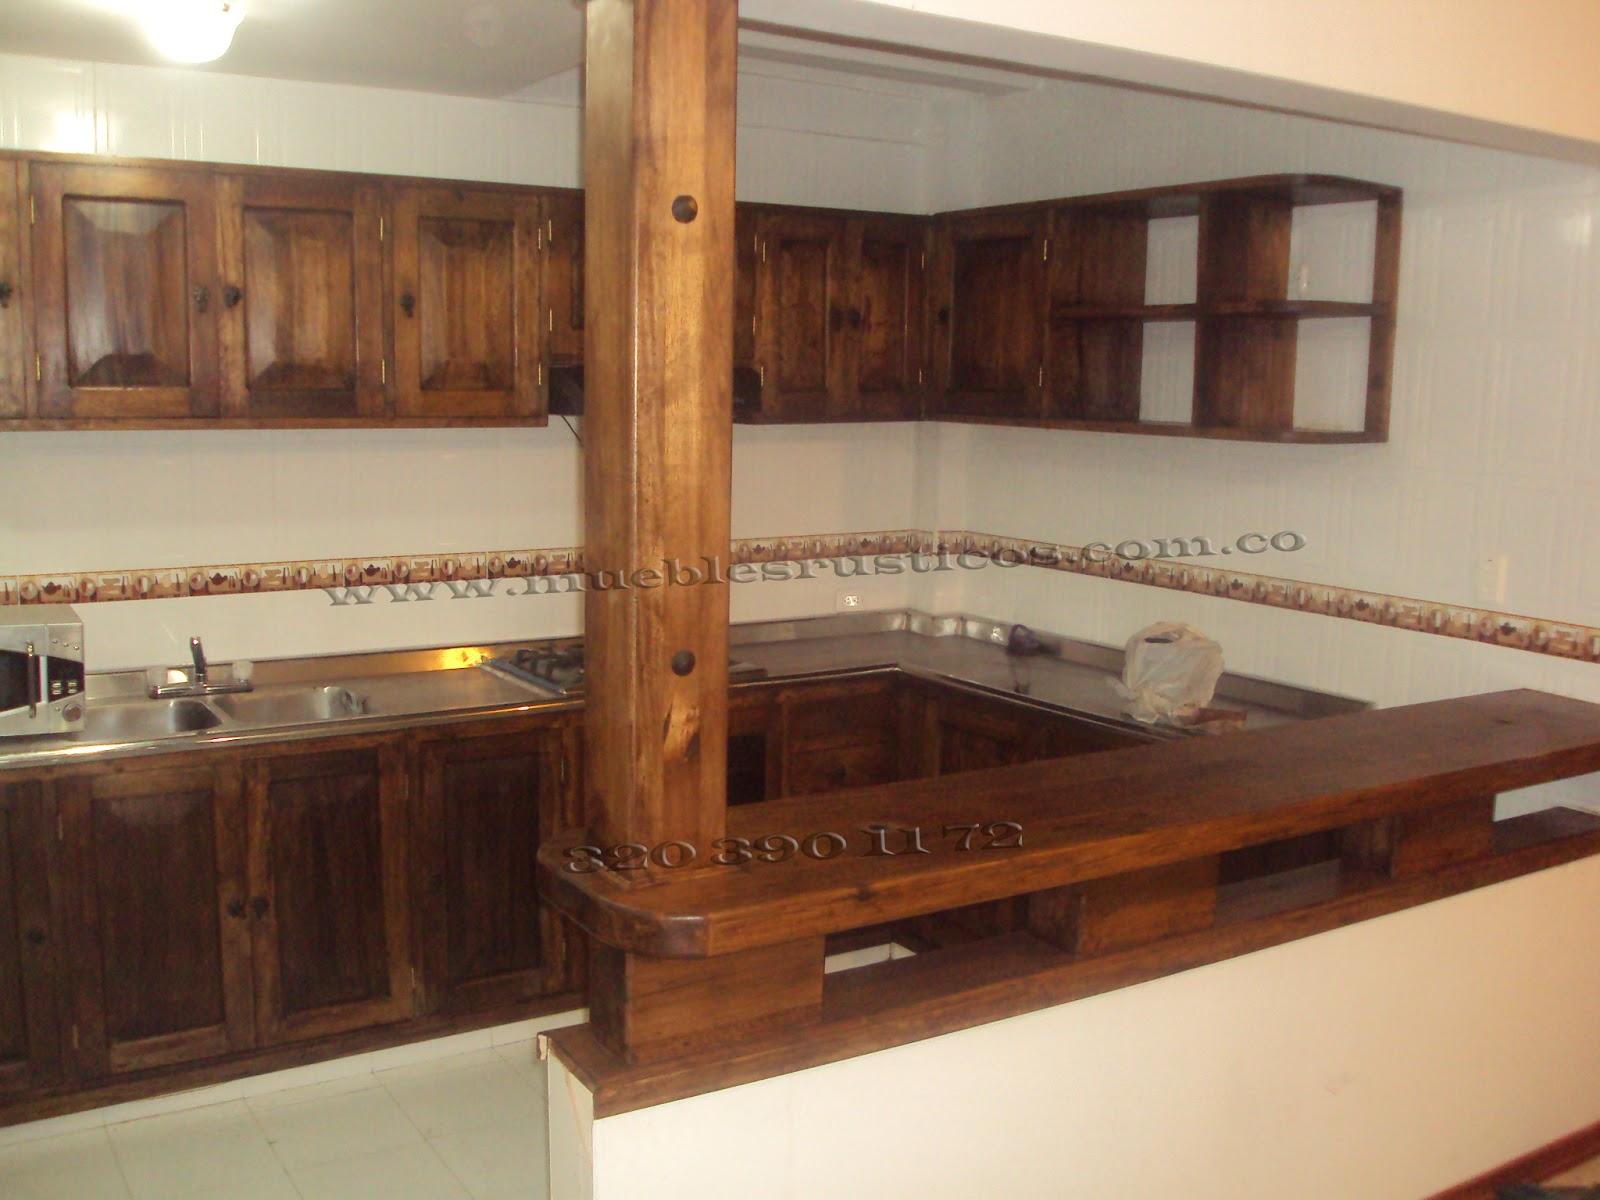 Muebles de cocina en madera bogota ideas for Muebles cocina bogota